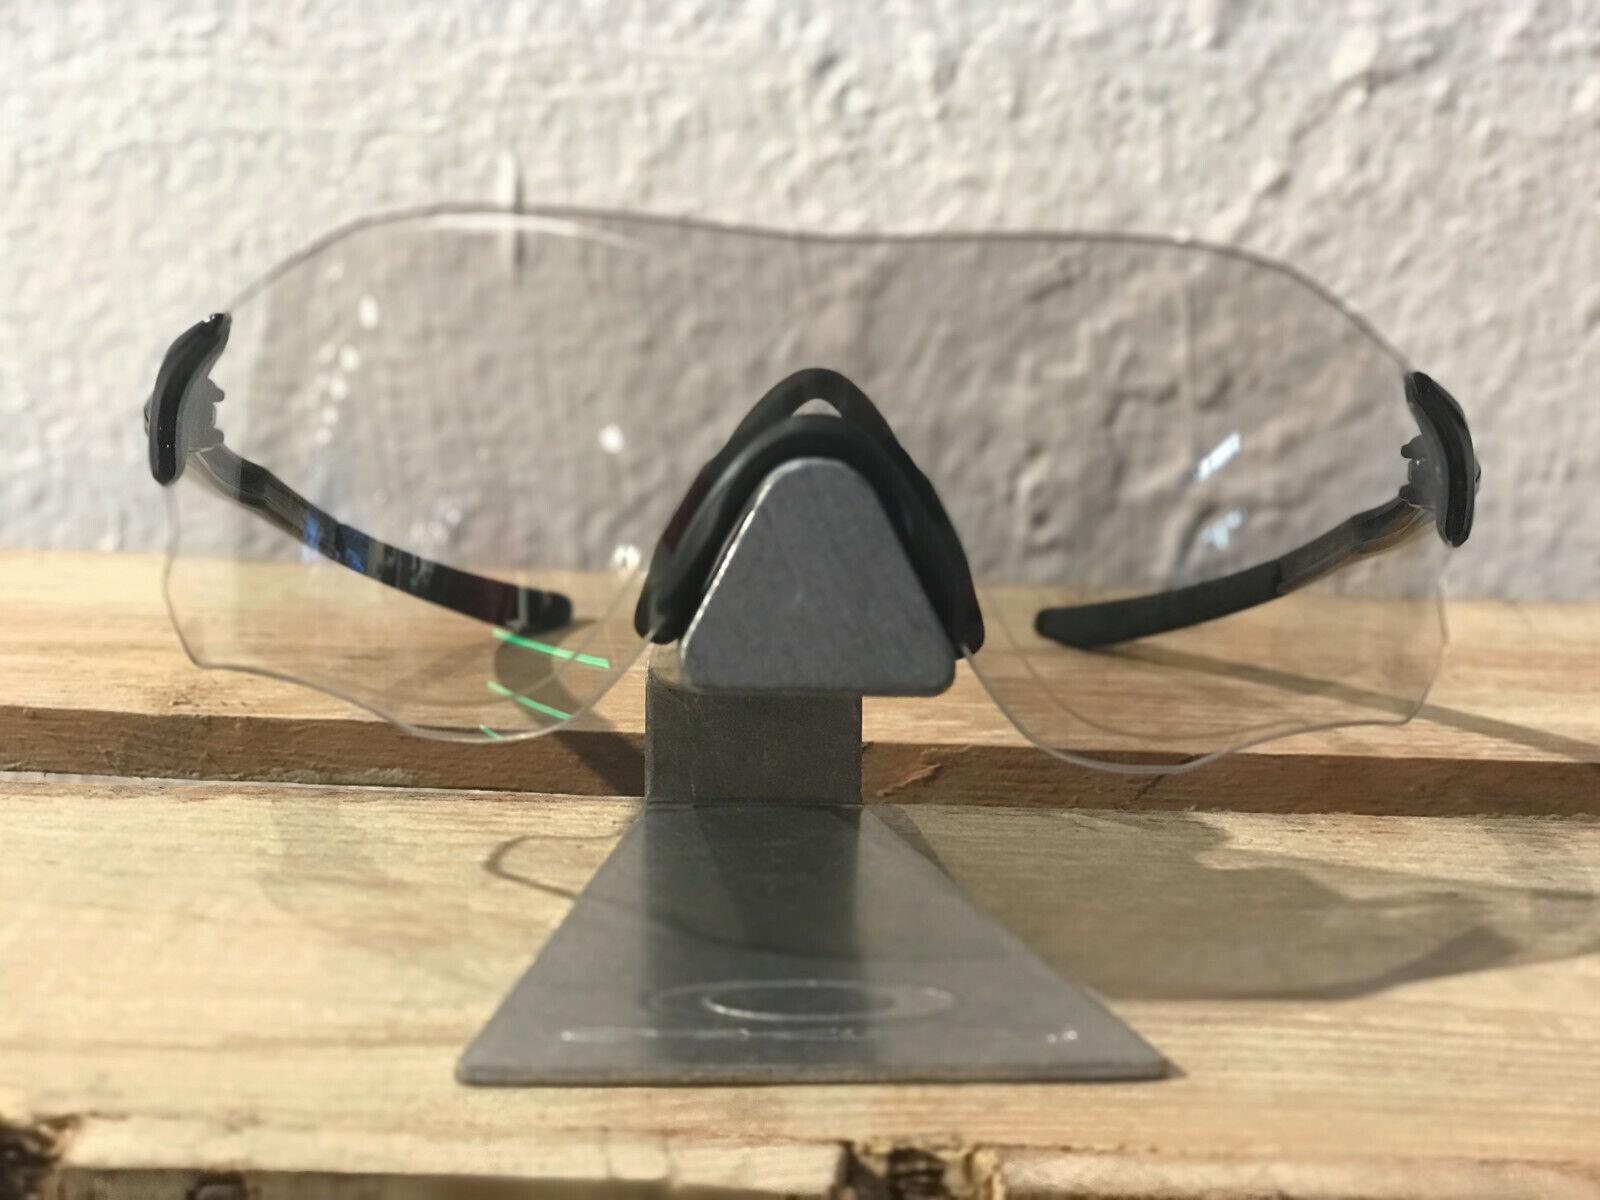 OAKLEY EVZERO PATH schwarz selbsttönend photochromic Road /MTB Brille OO930813